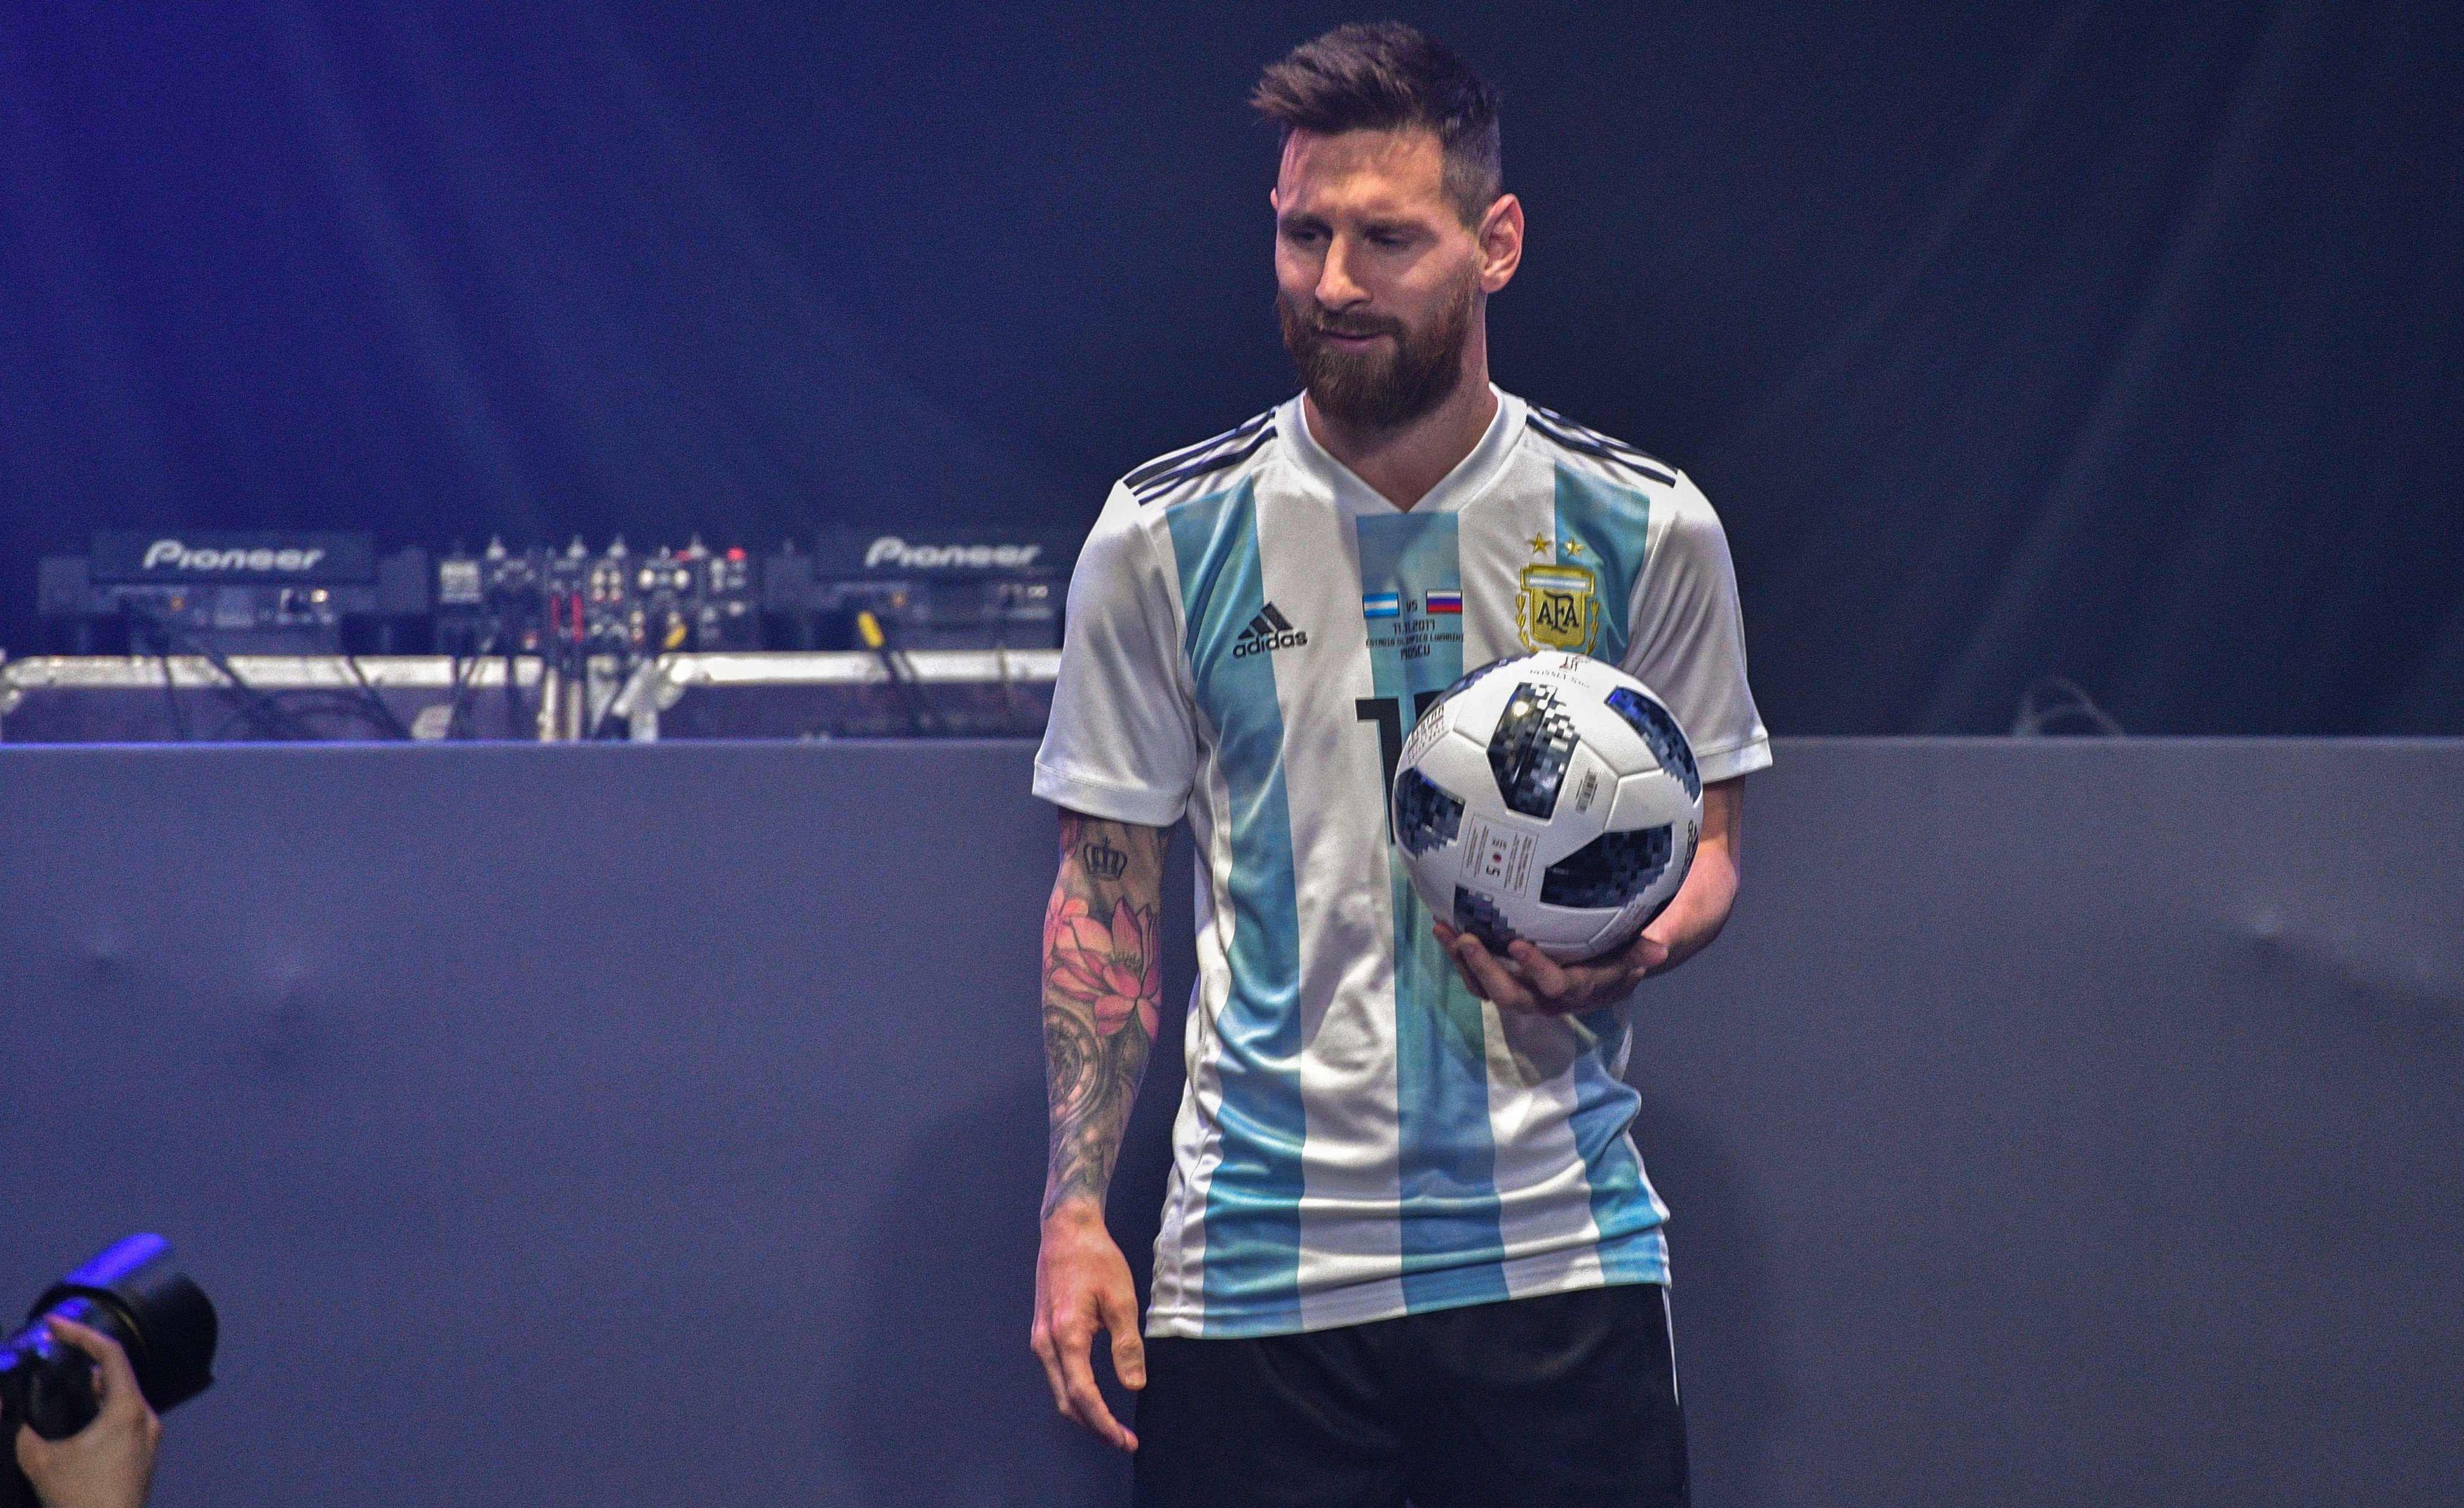 mondial 2018 messi pr sente le ballon officiel russie 2018 coupe du monde football. Black Bedroom Furniture Sets. Home Design Ideas